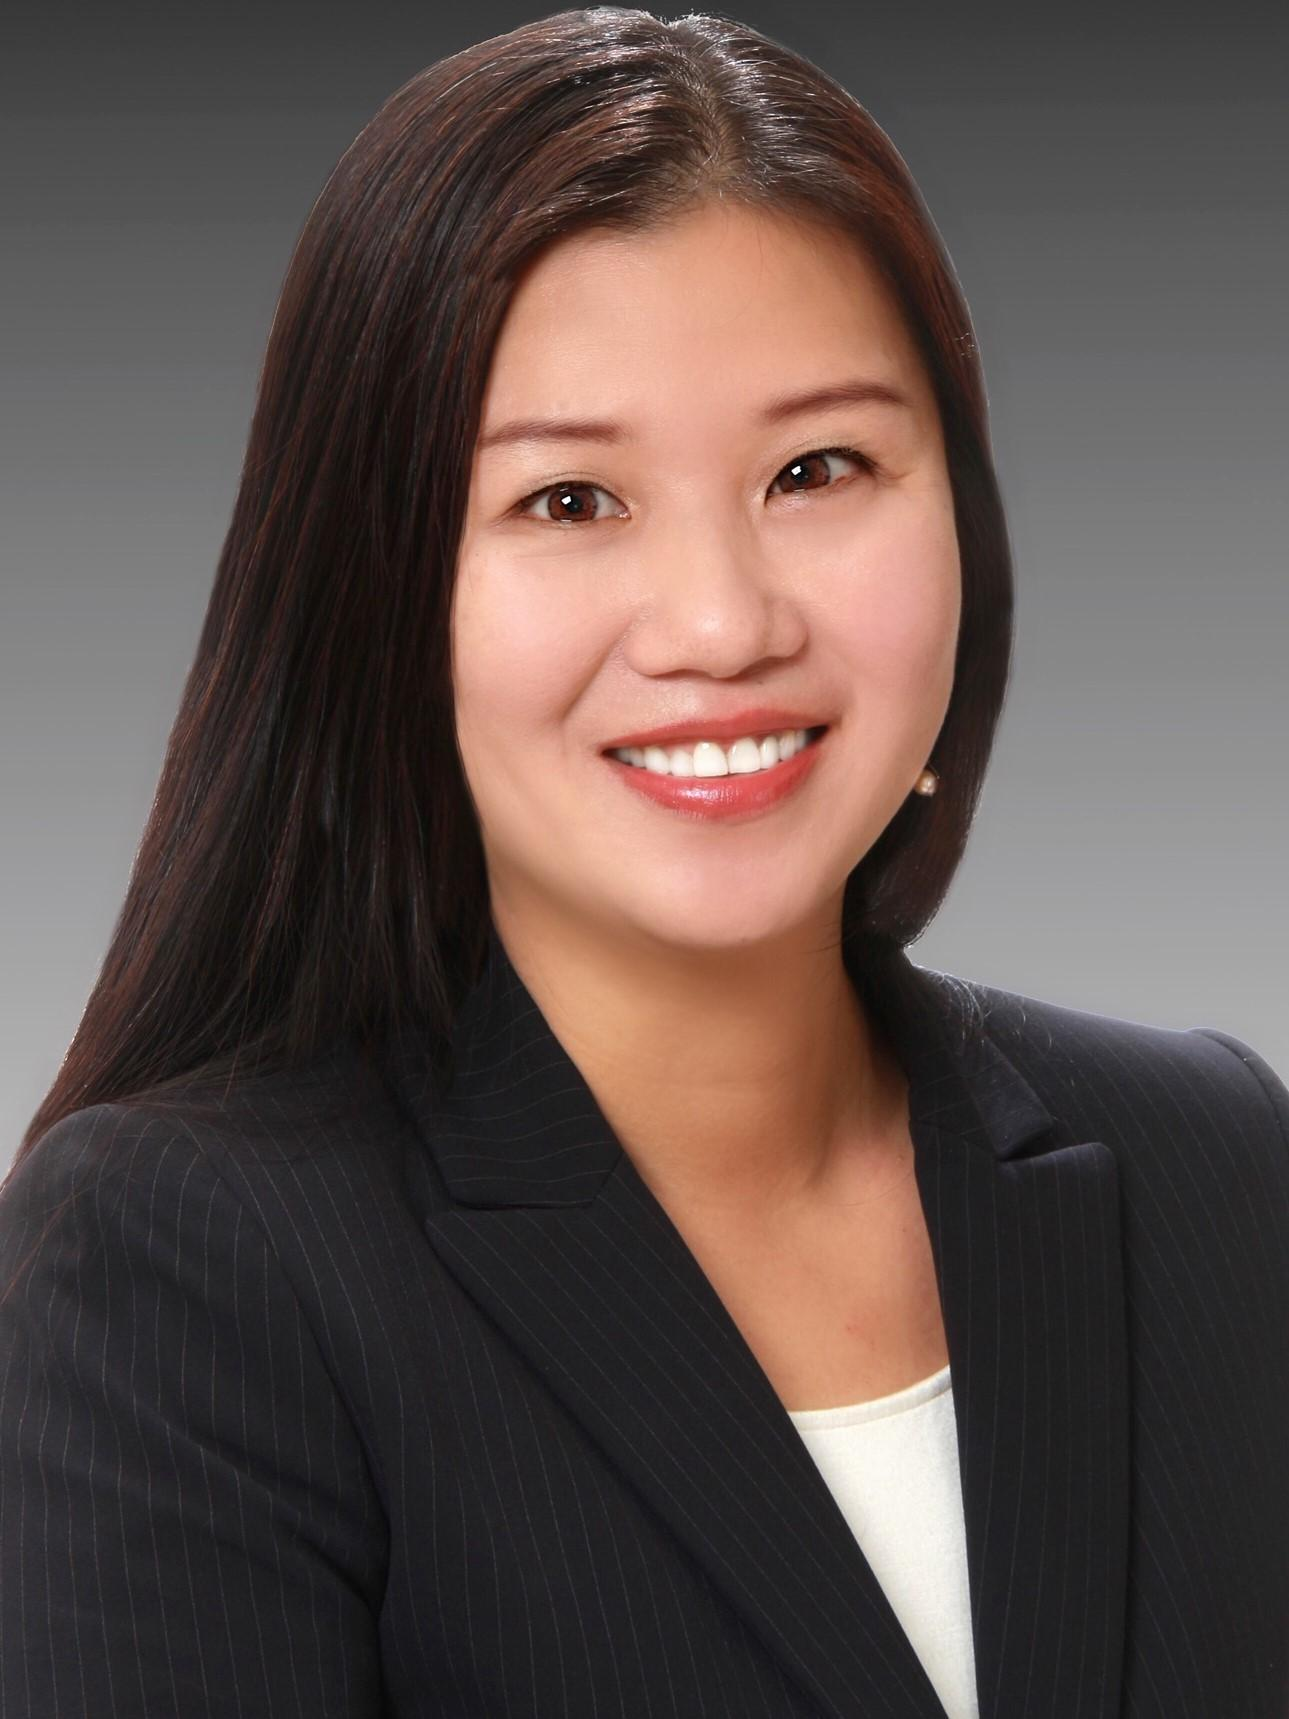 PEI-WEN LIANG  Your Registered Representative & Insurance Agent